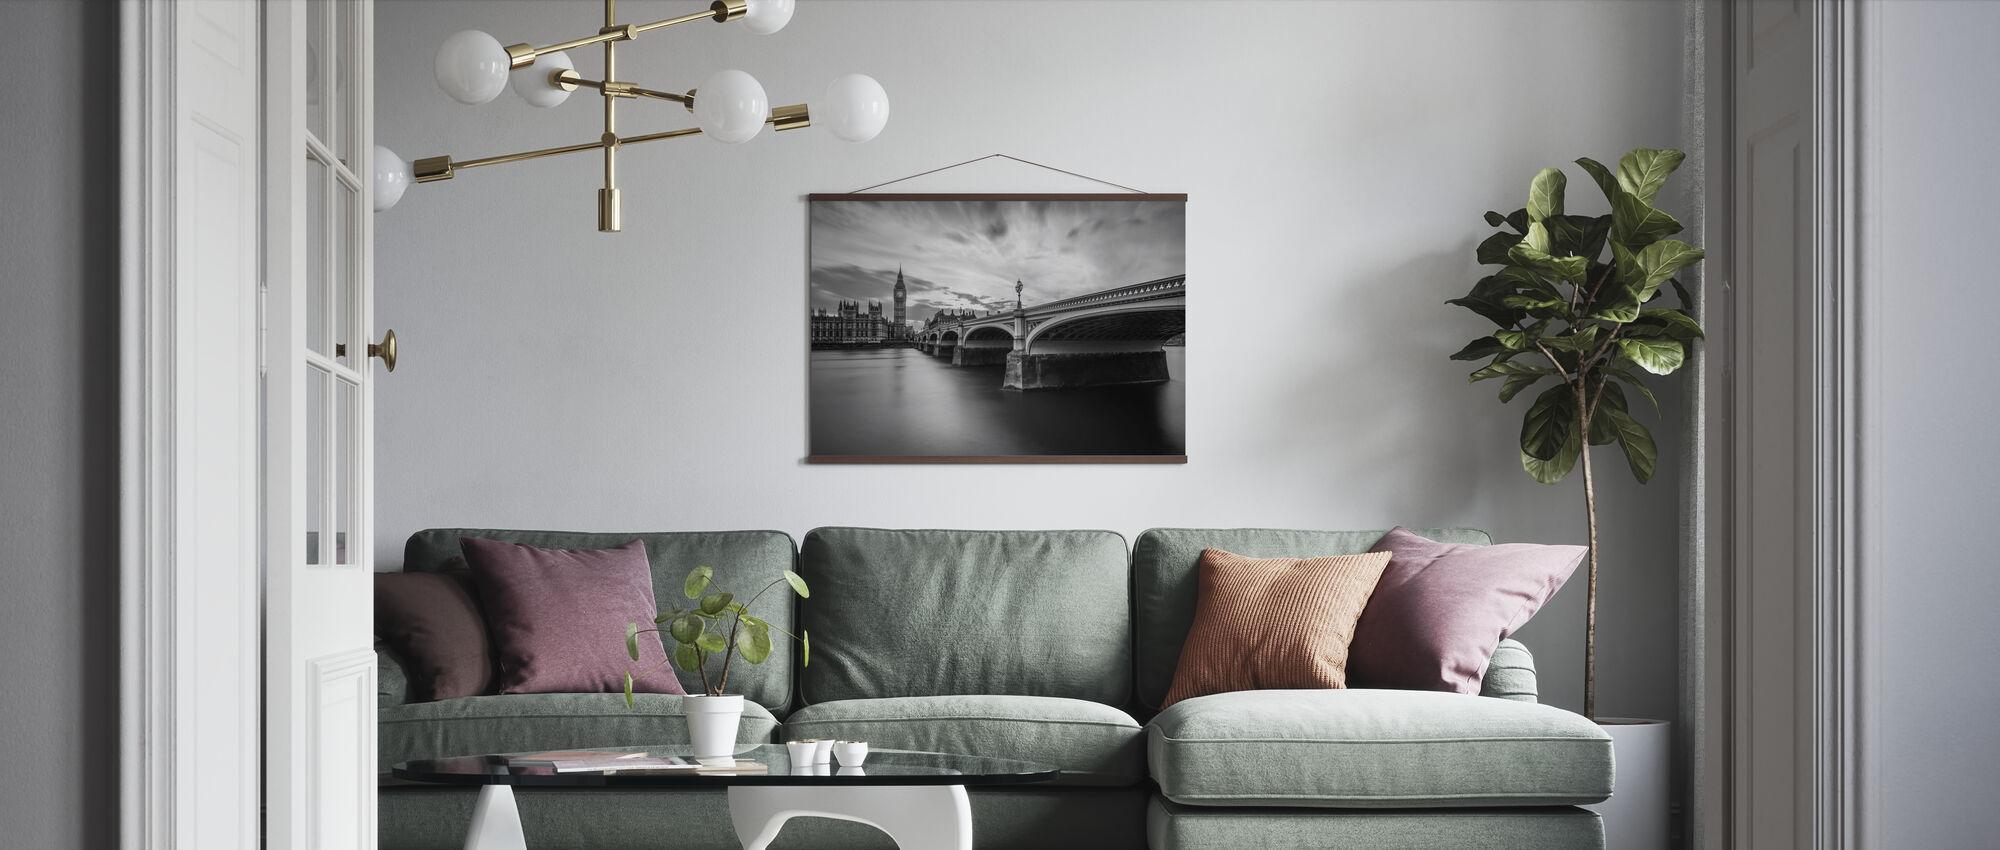 Westminster Serenity - Poster - Living Room